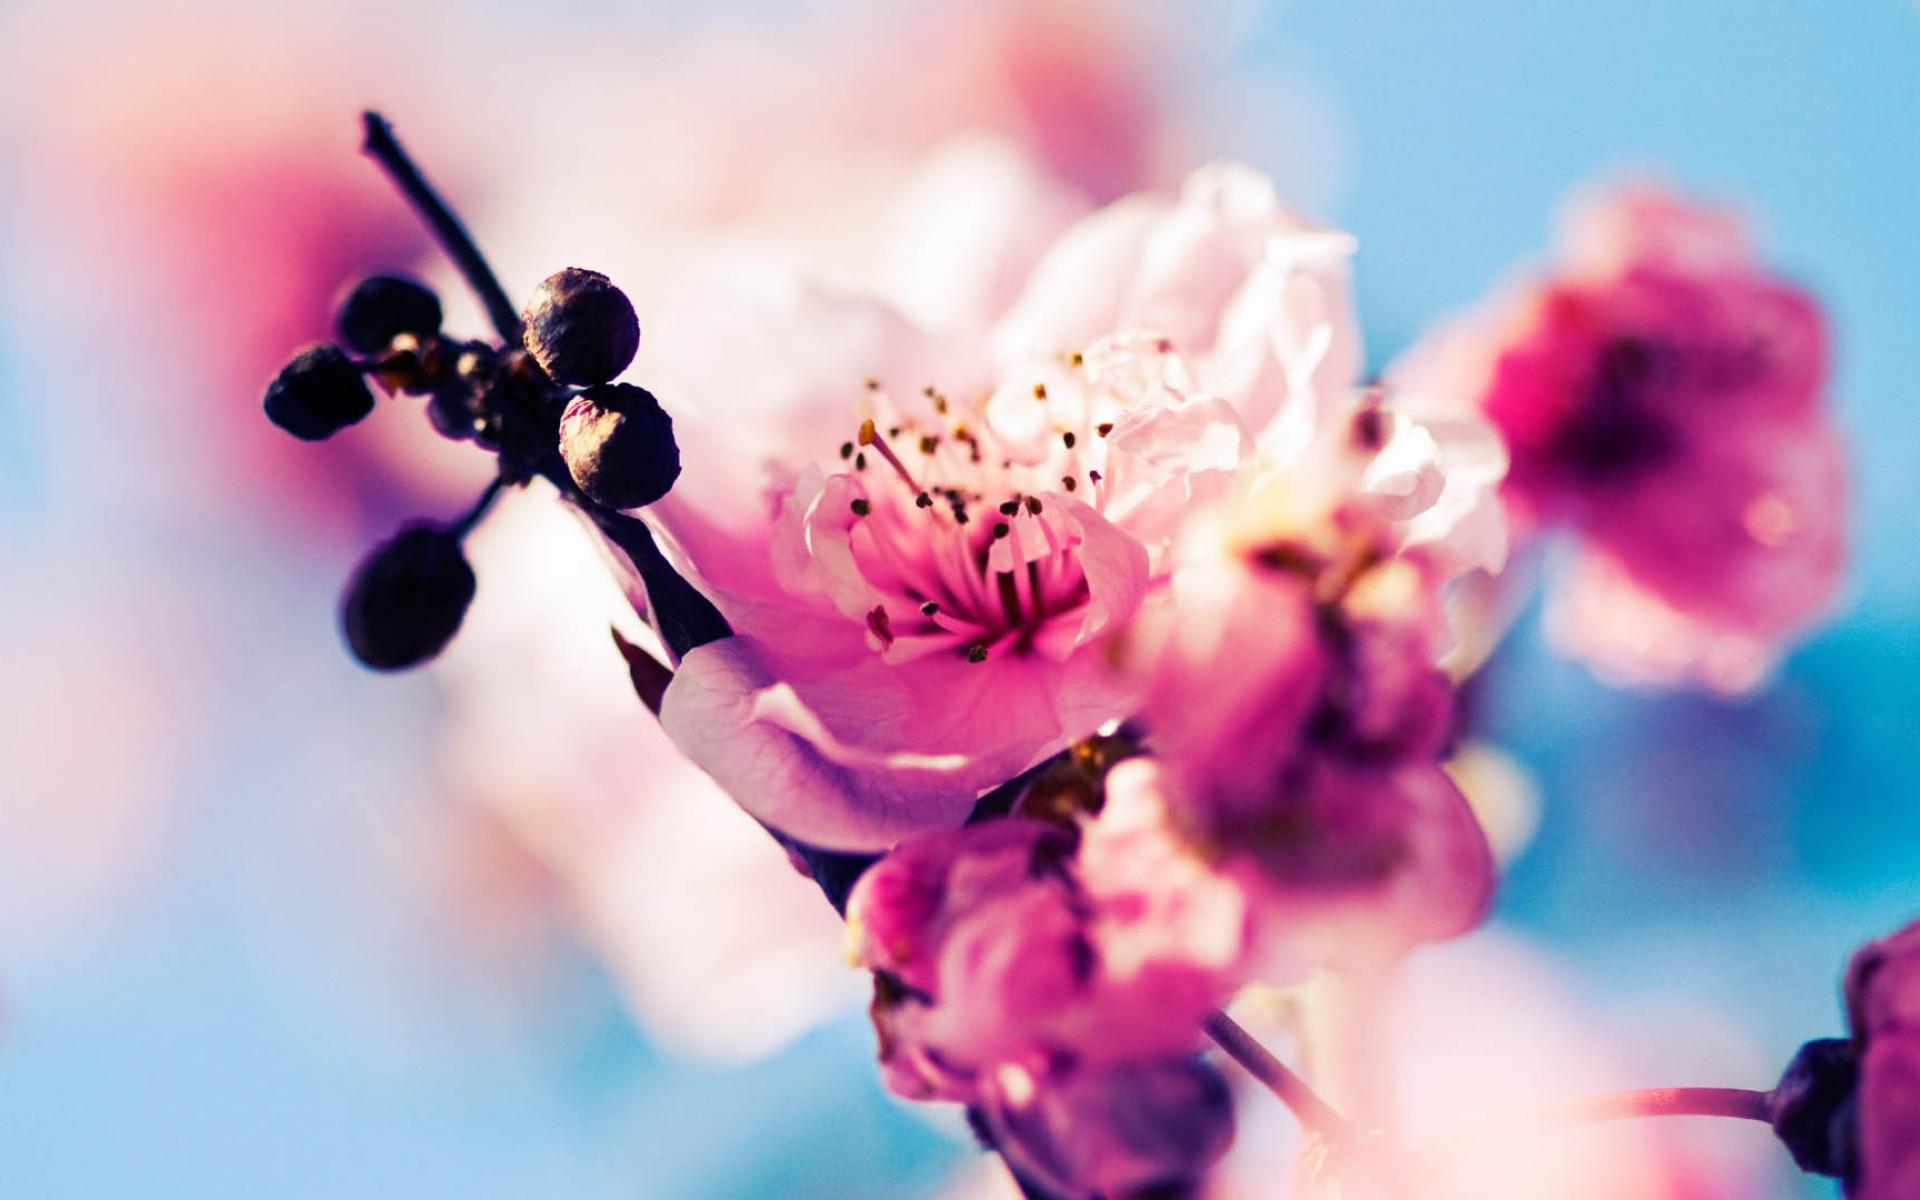 Картинки цветы, макро, цветение, весна фото и обои на рабочий стол